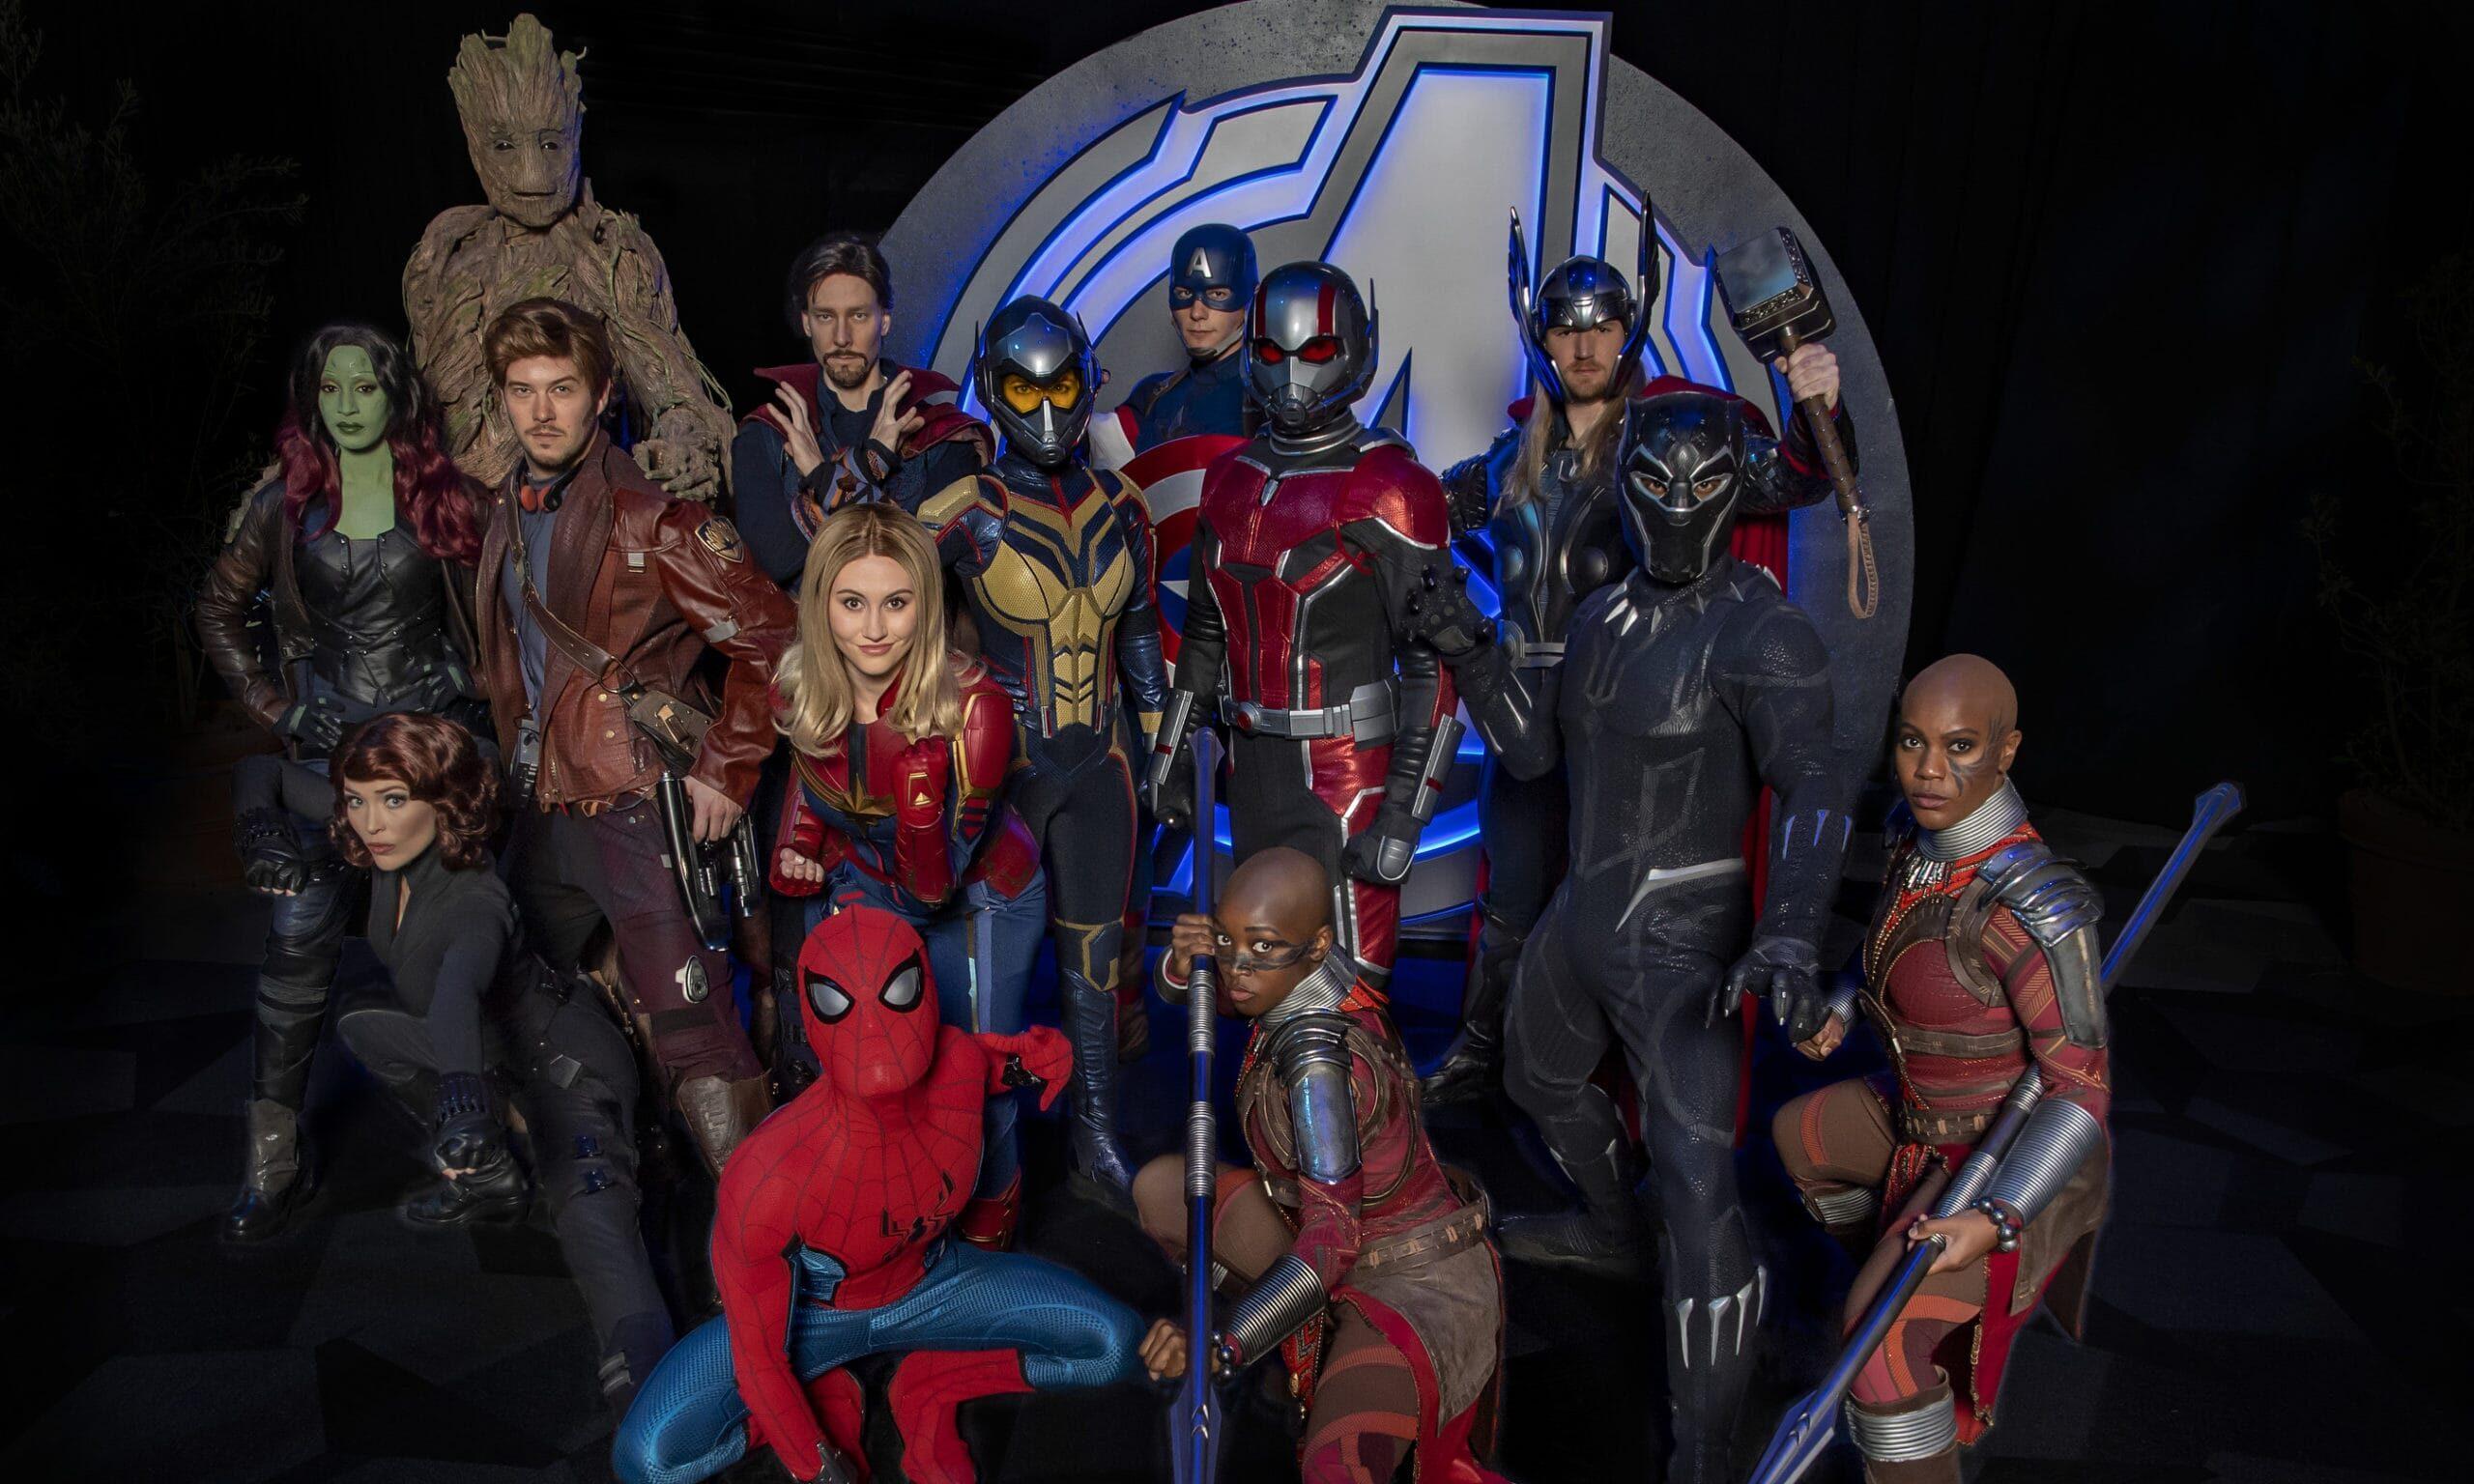 Marvel Characters from Avengers Campus at Disney California Adventure Park (Joshua Sudock/Disneyland Resort)